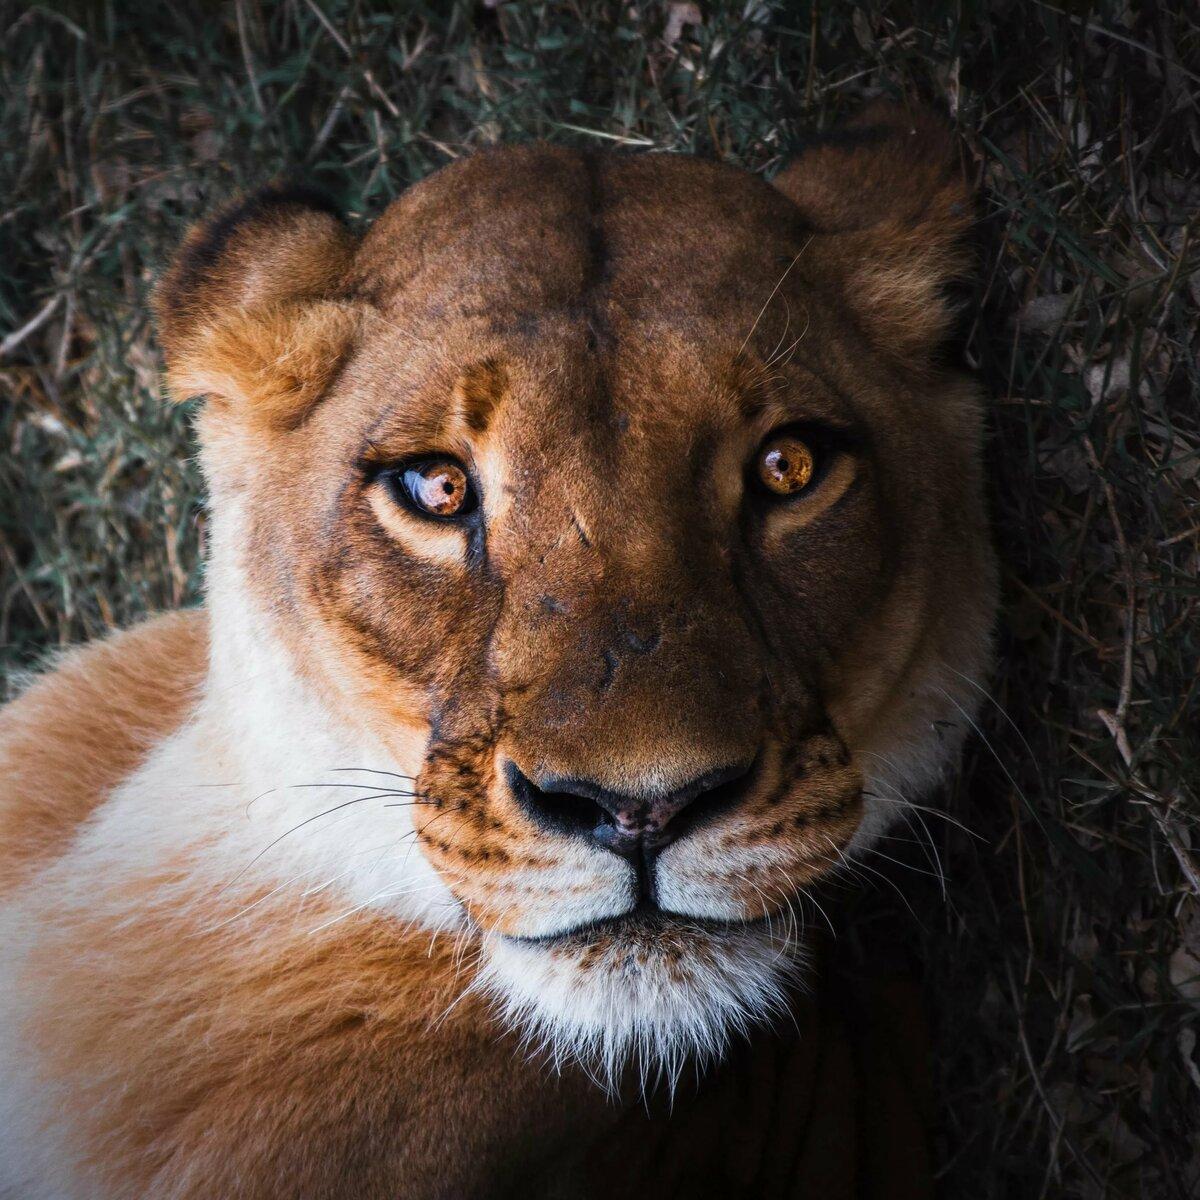 Картинка на аву львица